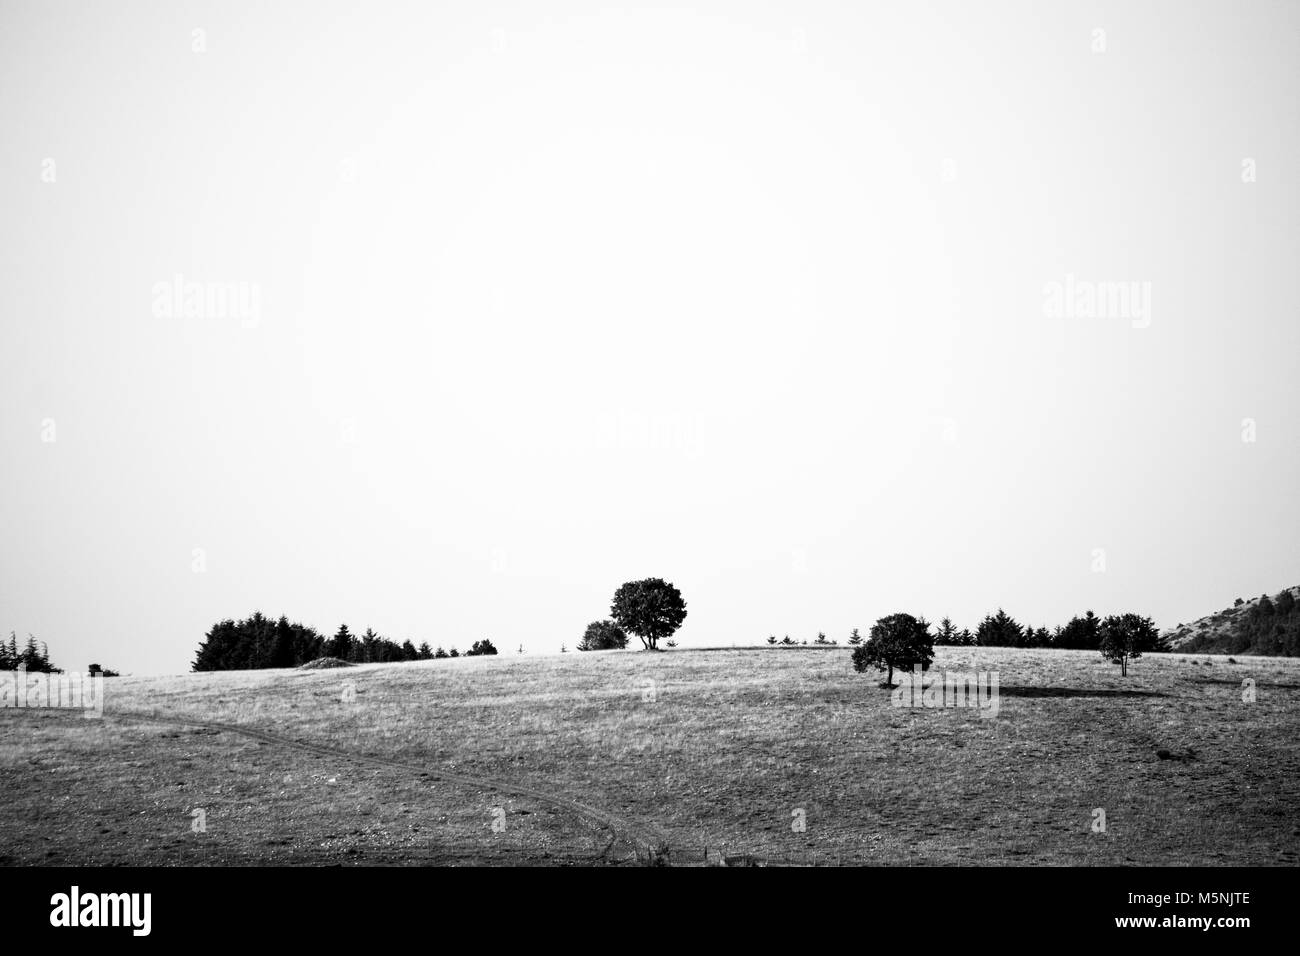 Bäume auf einem Hügel. Stockbild